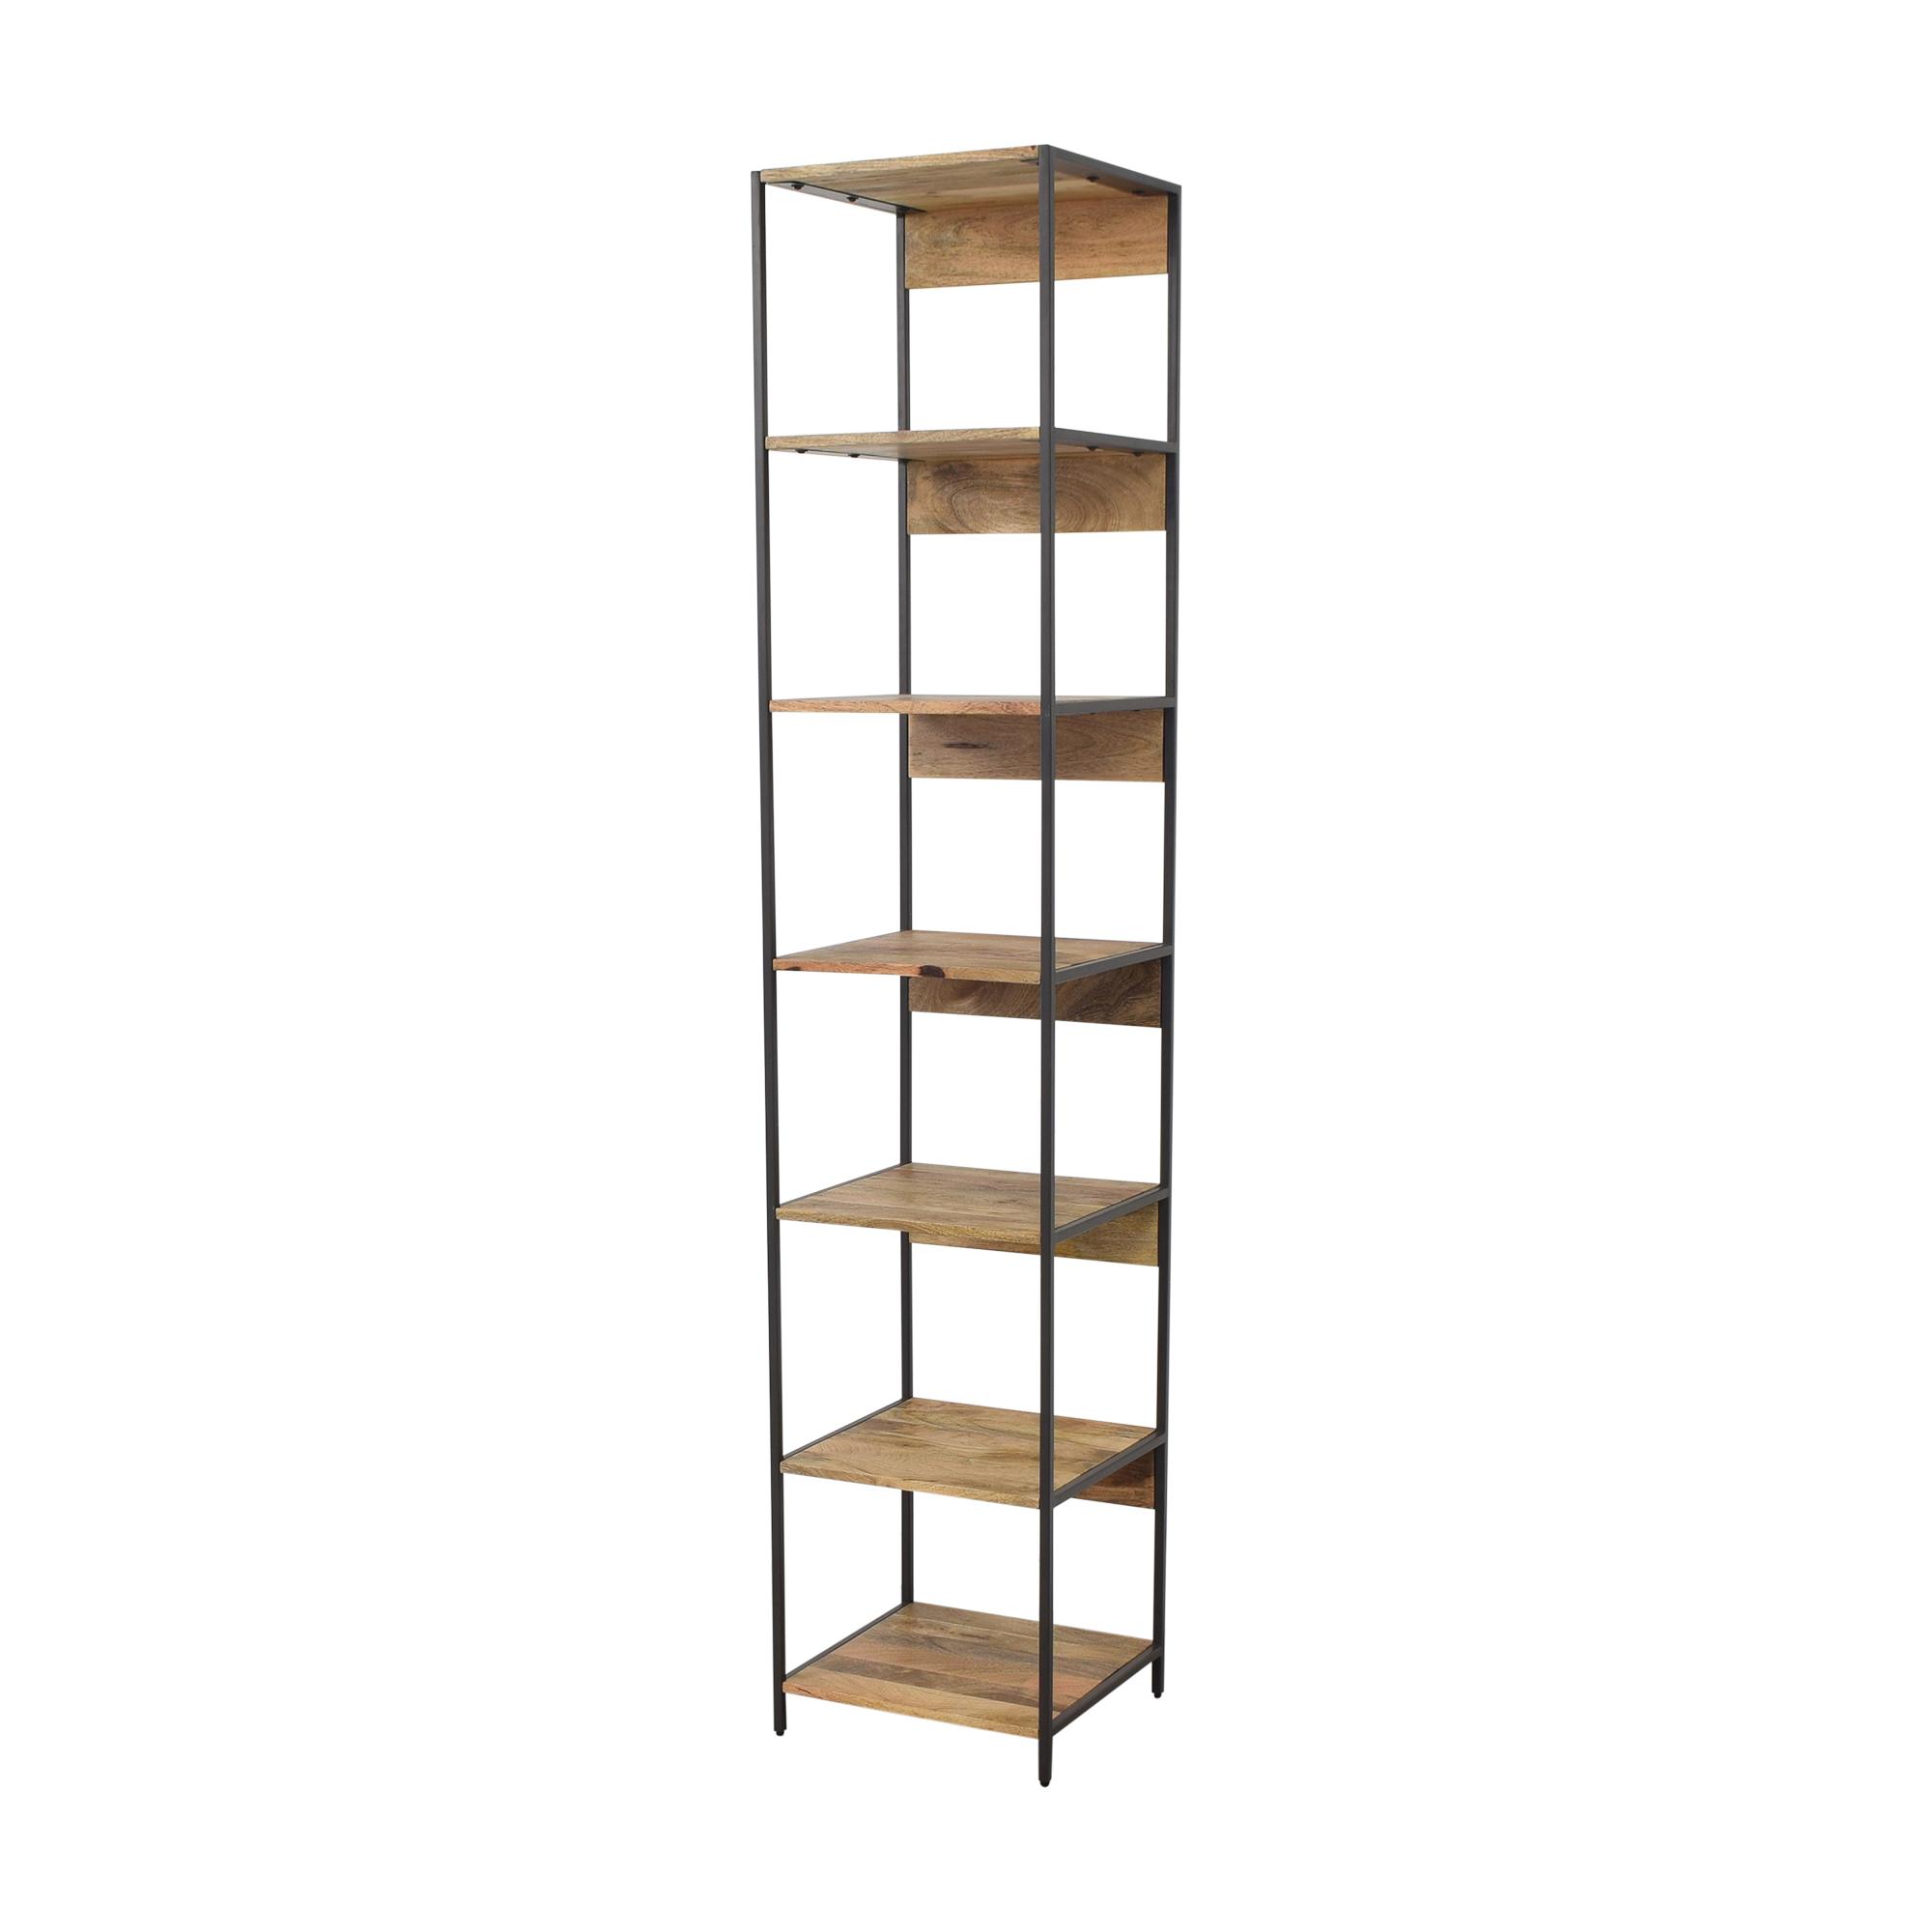 West Elm West Elm Industrial Modular Bookshelf Bookcases & Shelving